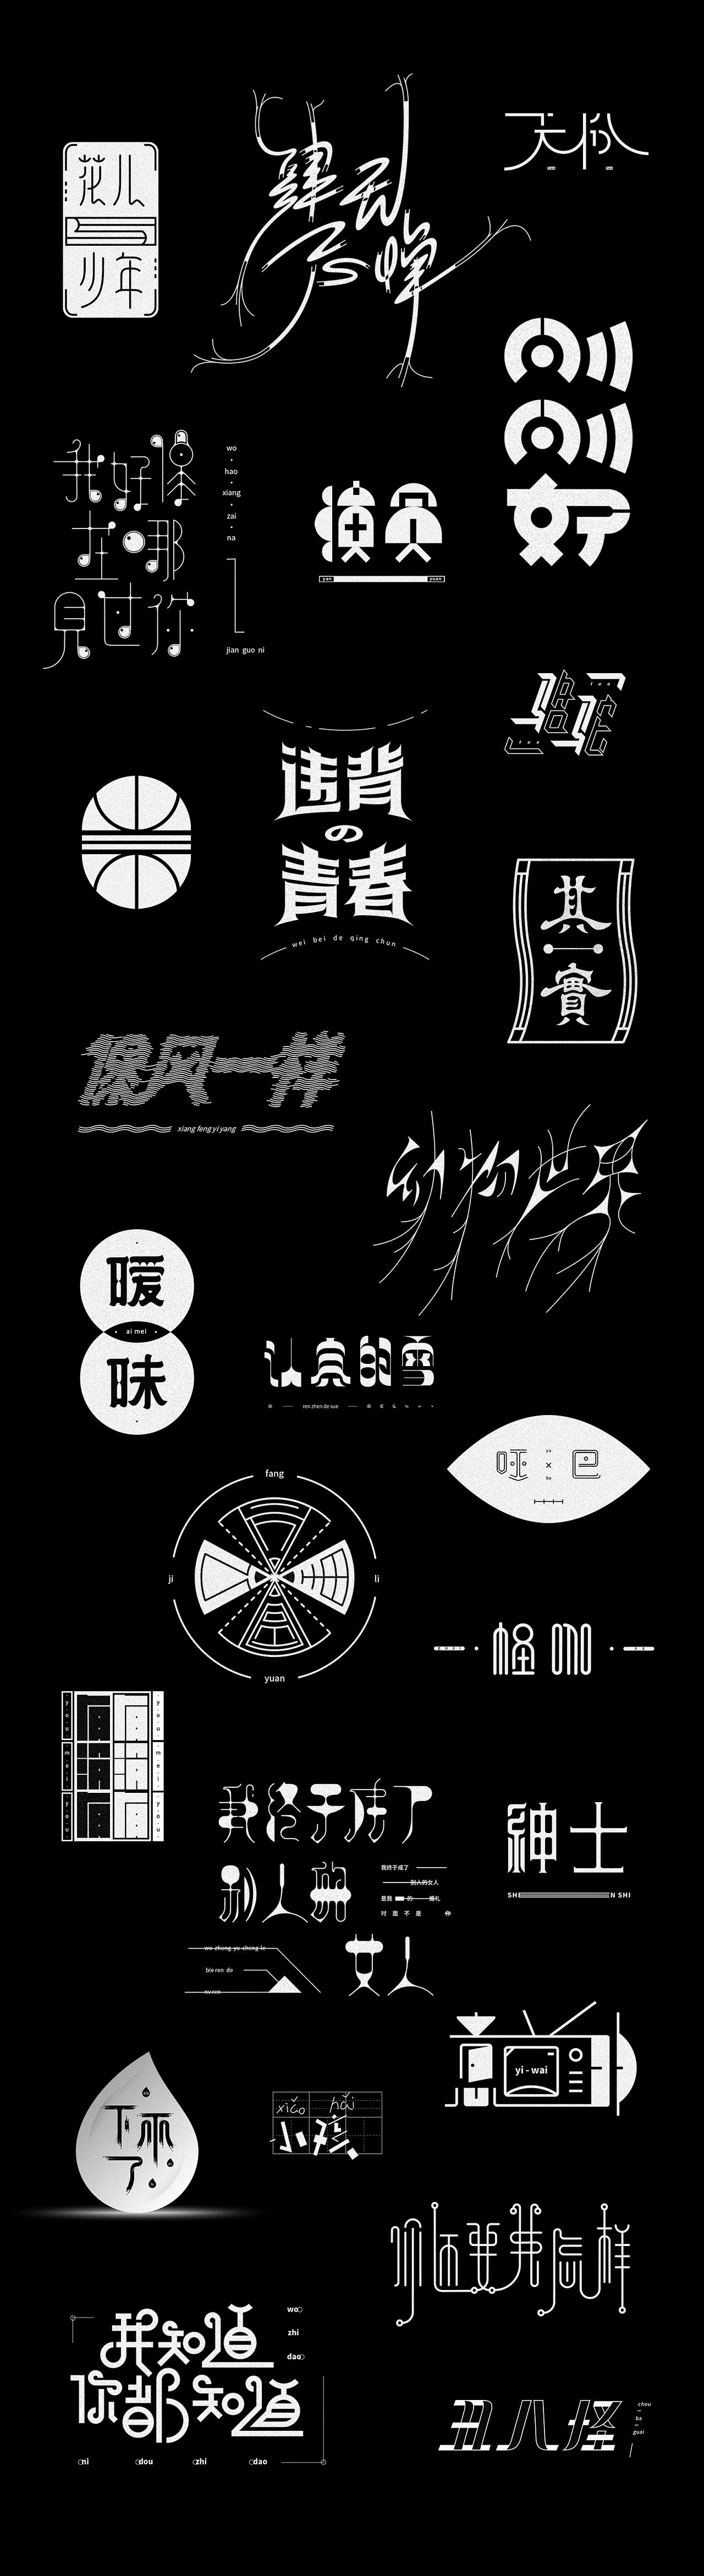 18P Creative Chinese font logo design scheme #.1243